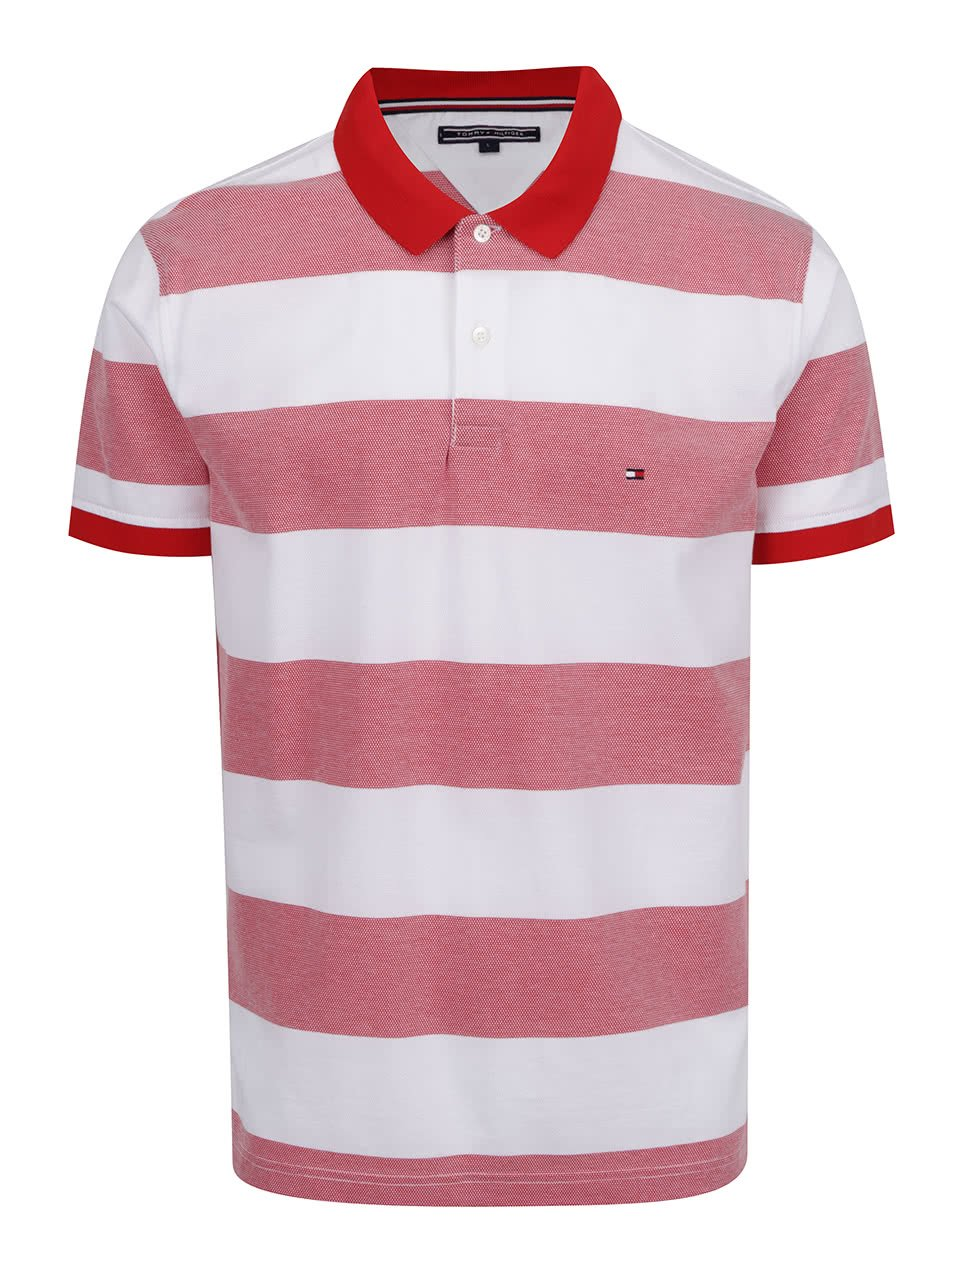 Bílo-červené pánské pruhované polo triko Tommy Hilfiger